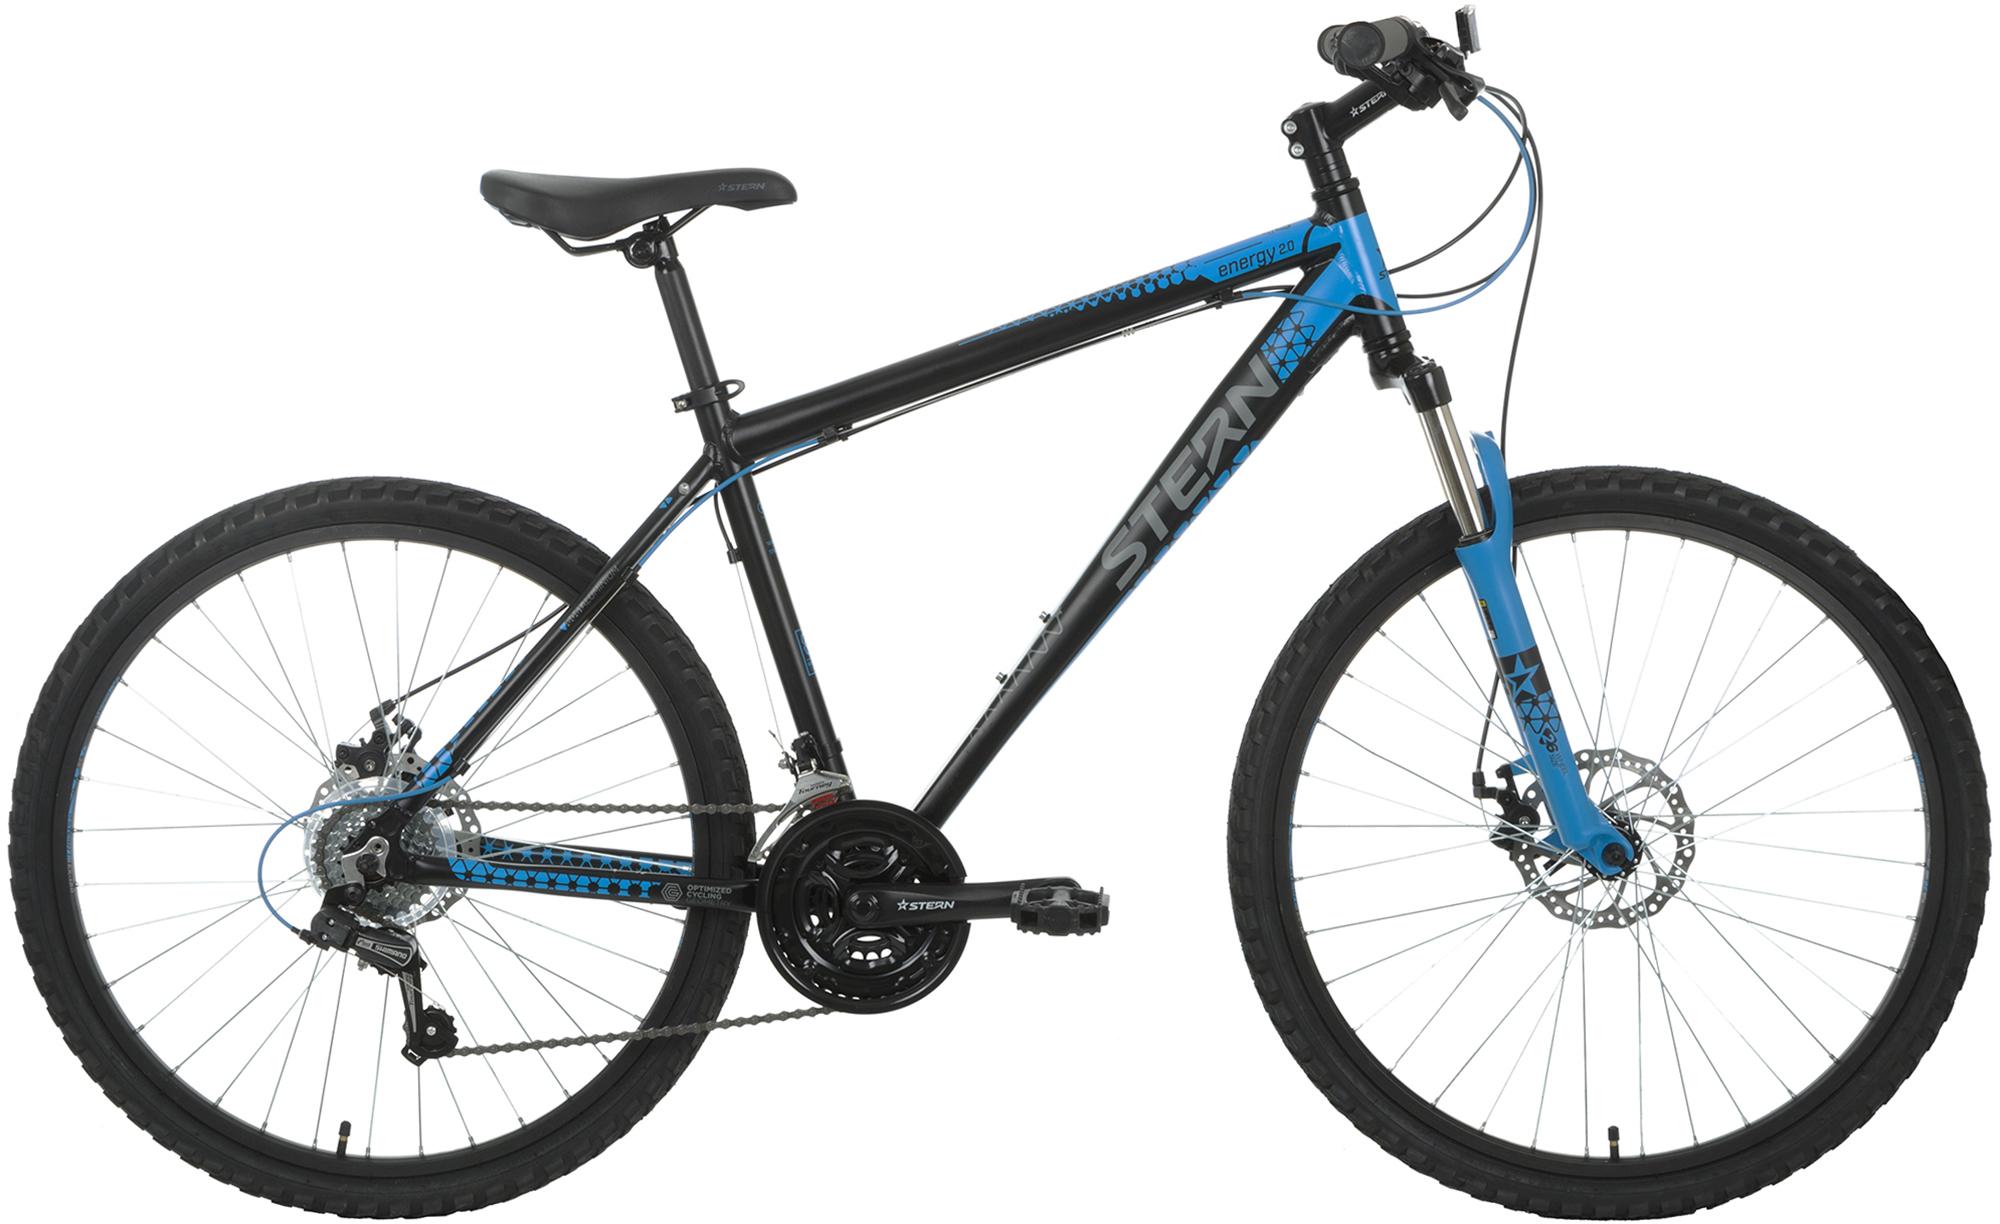 Stern Велосипед горный Stern Energy 2.0 26'' stern велосипед горный женский stern vega 1 0 26